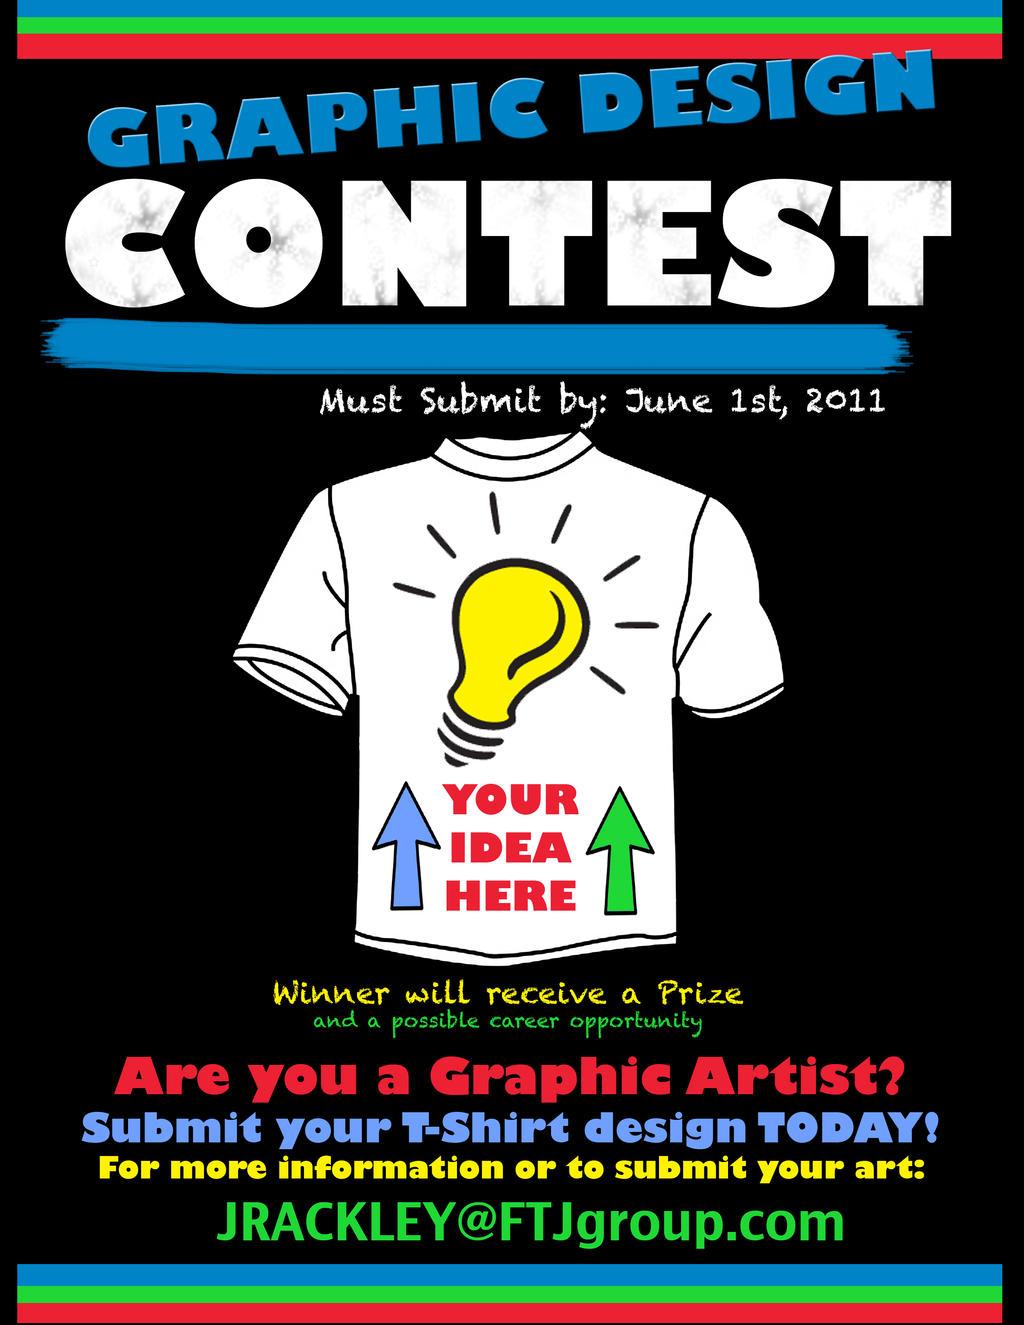 T shirt poster design -  Link